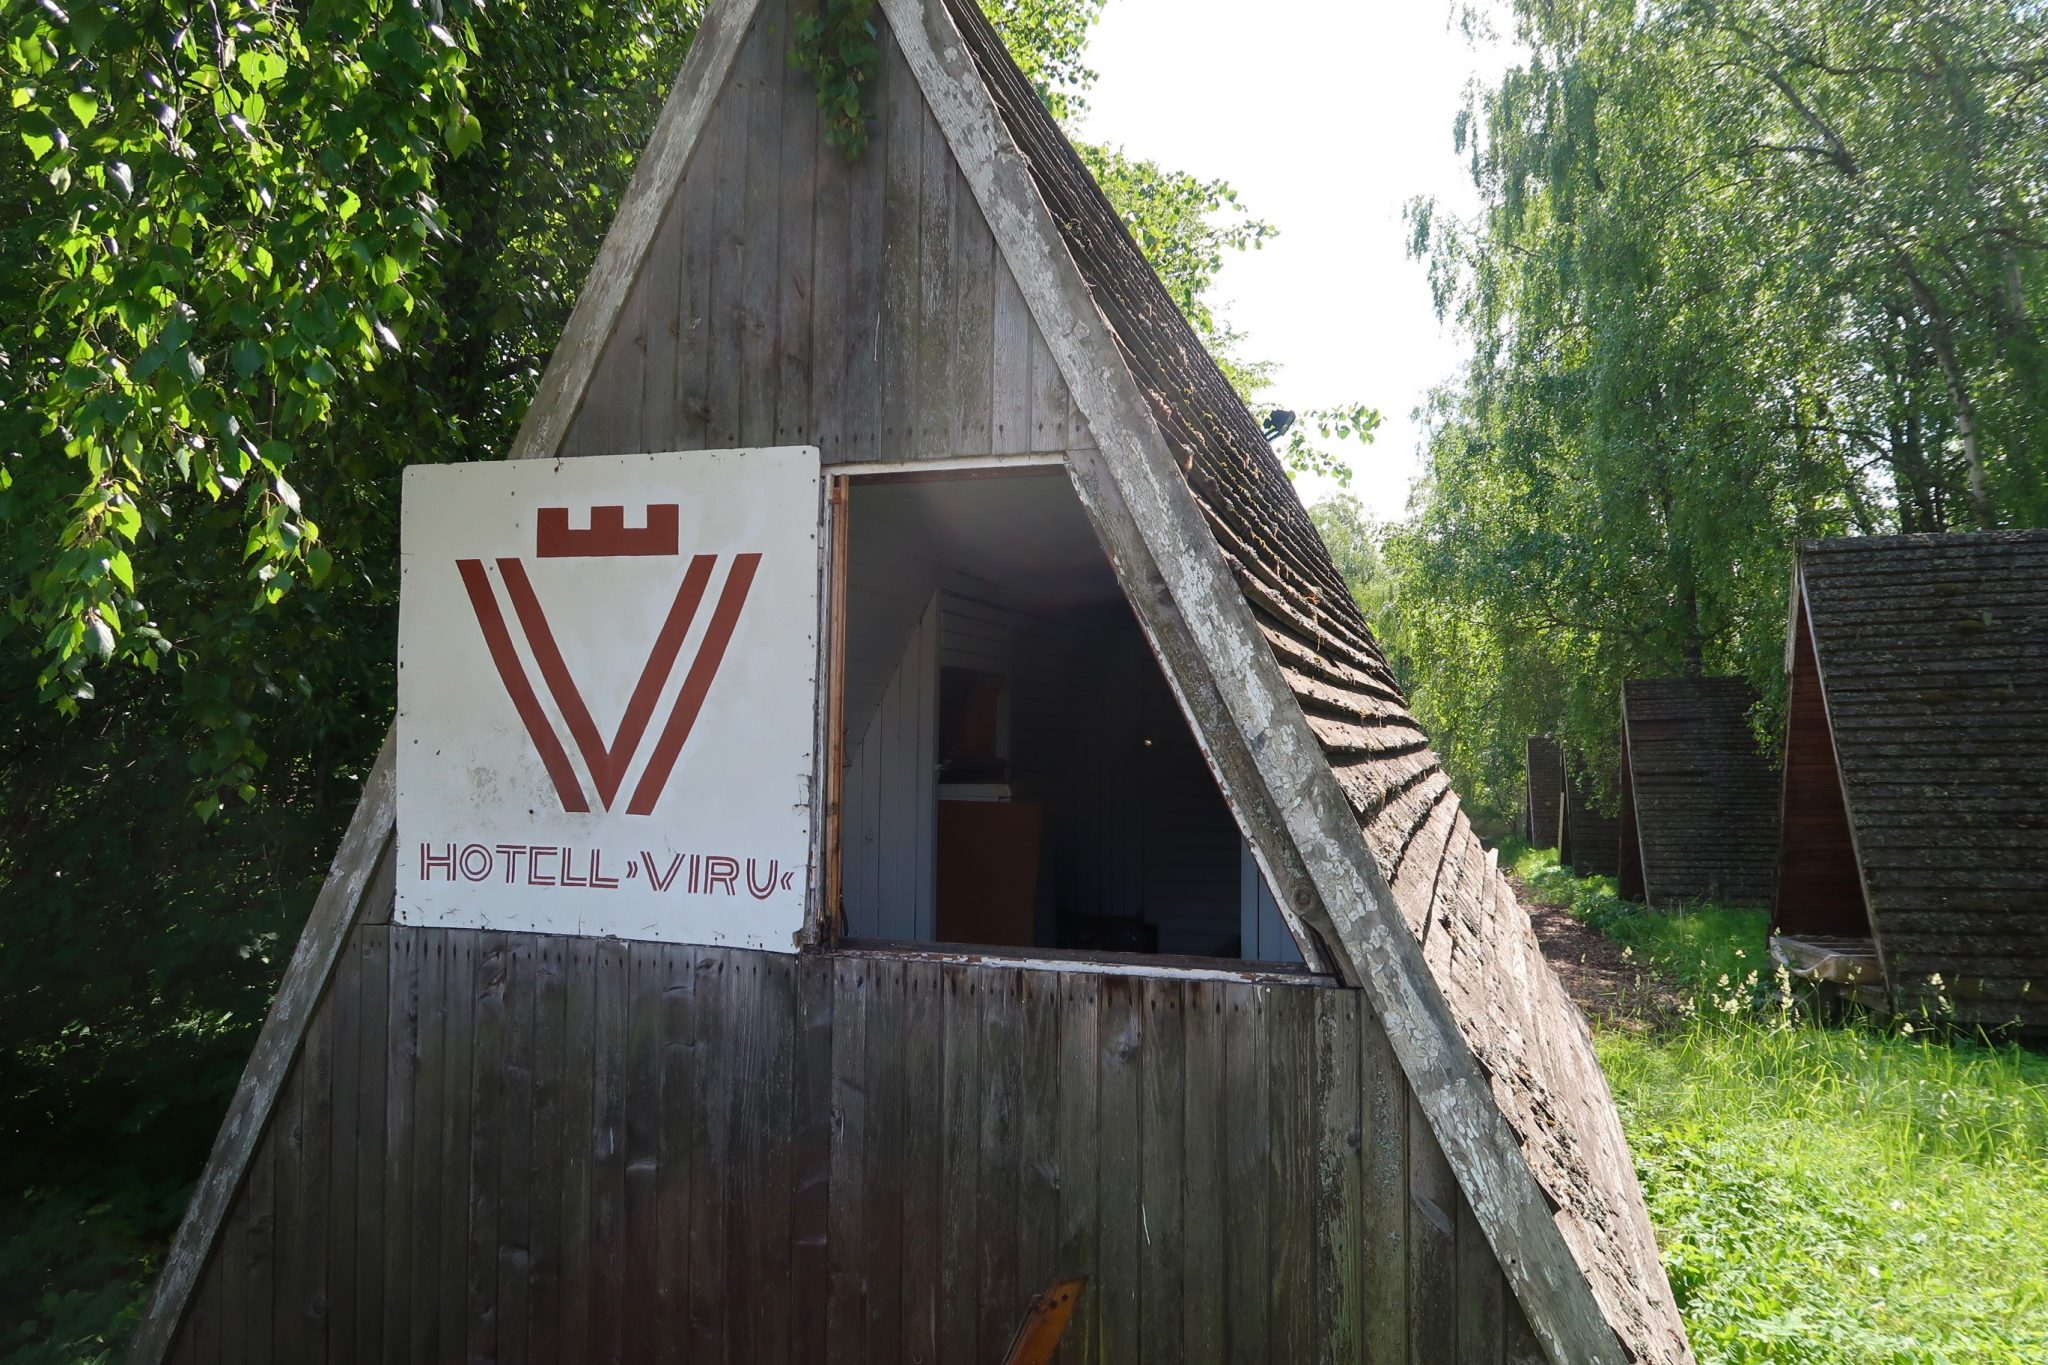 Hotell Viru